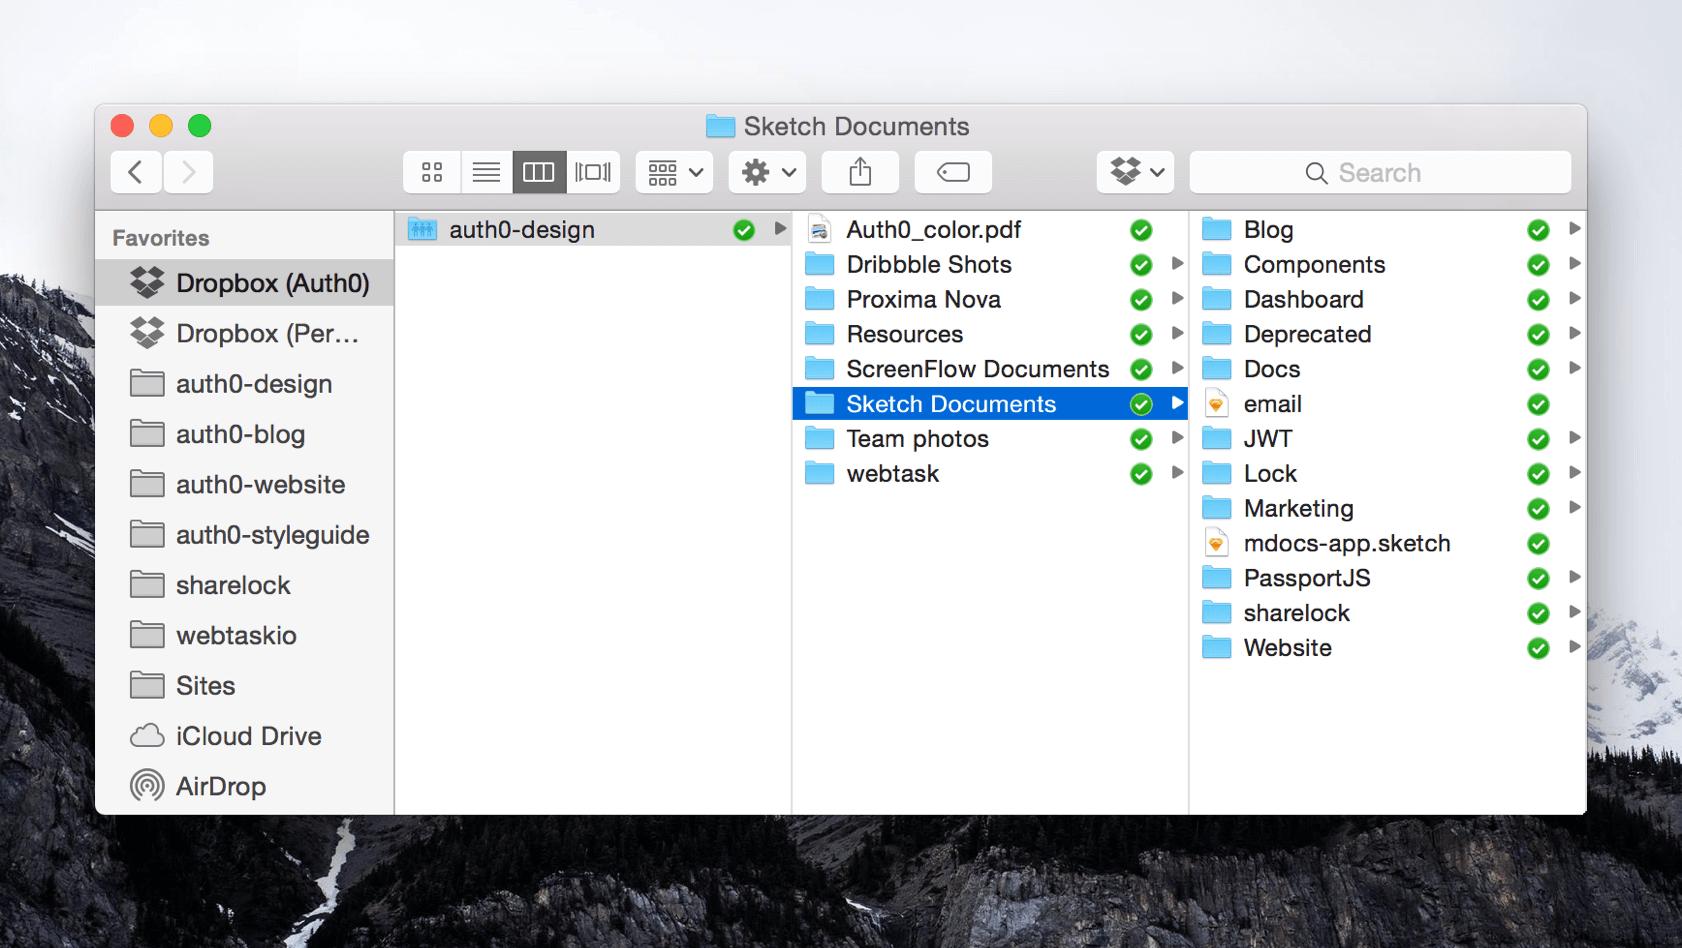 Design process Dropbox usage